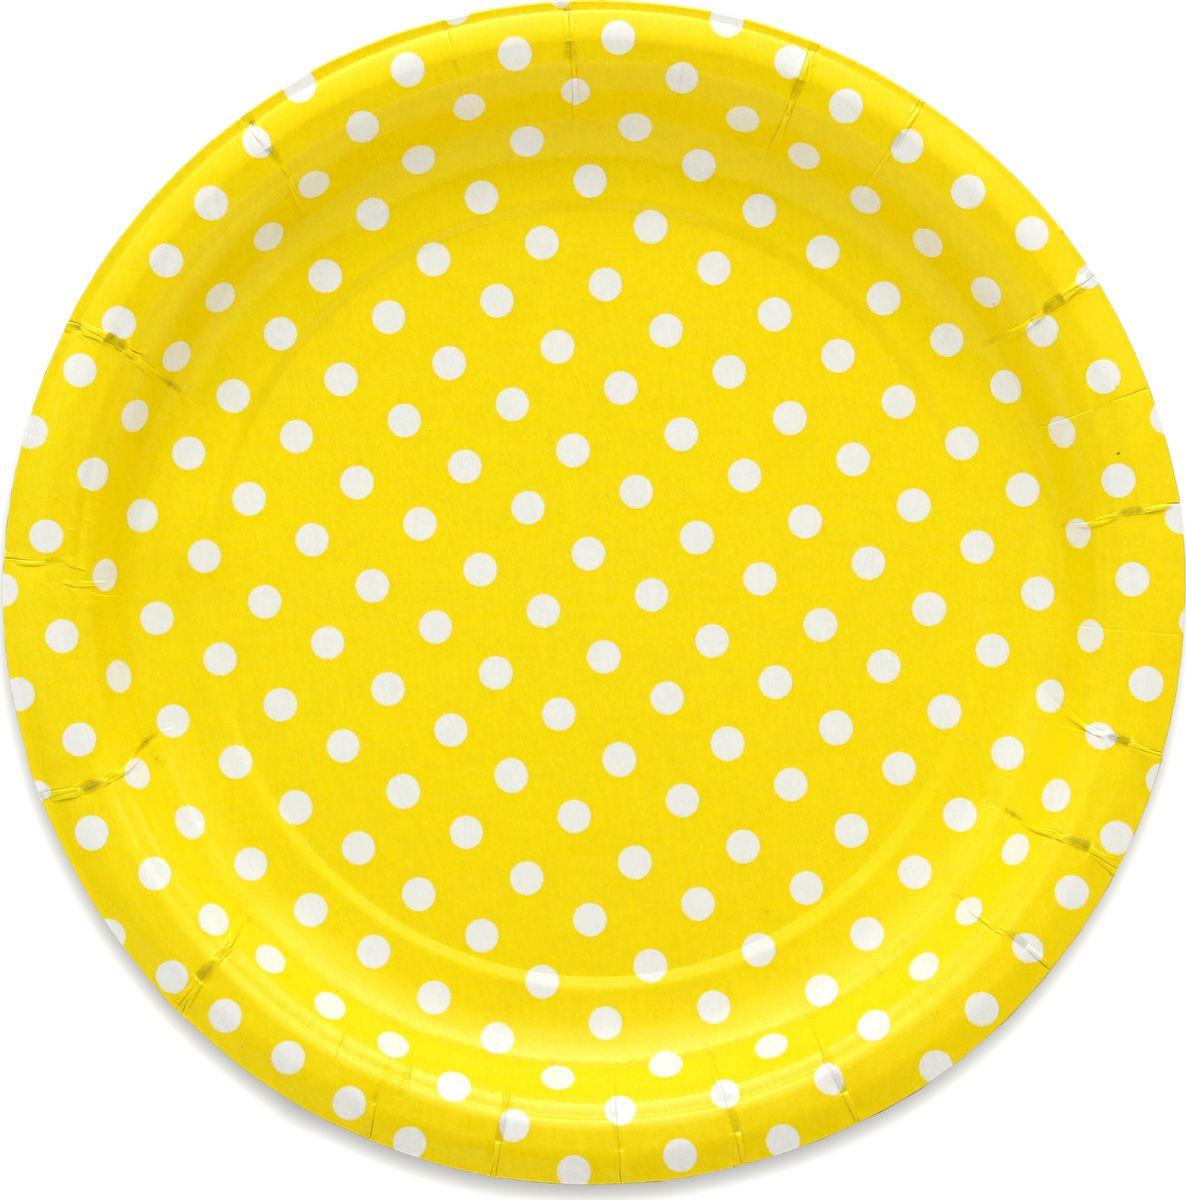 Тарелка бумажная Miland Yellow Pin Up, 17 см, 6 шт